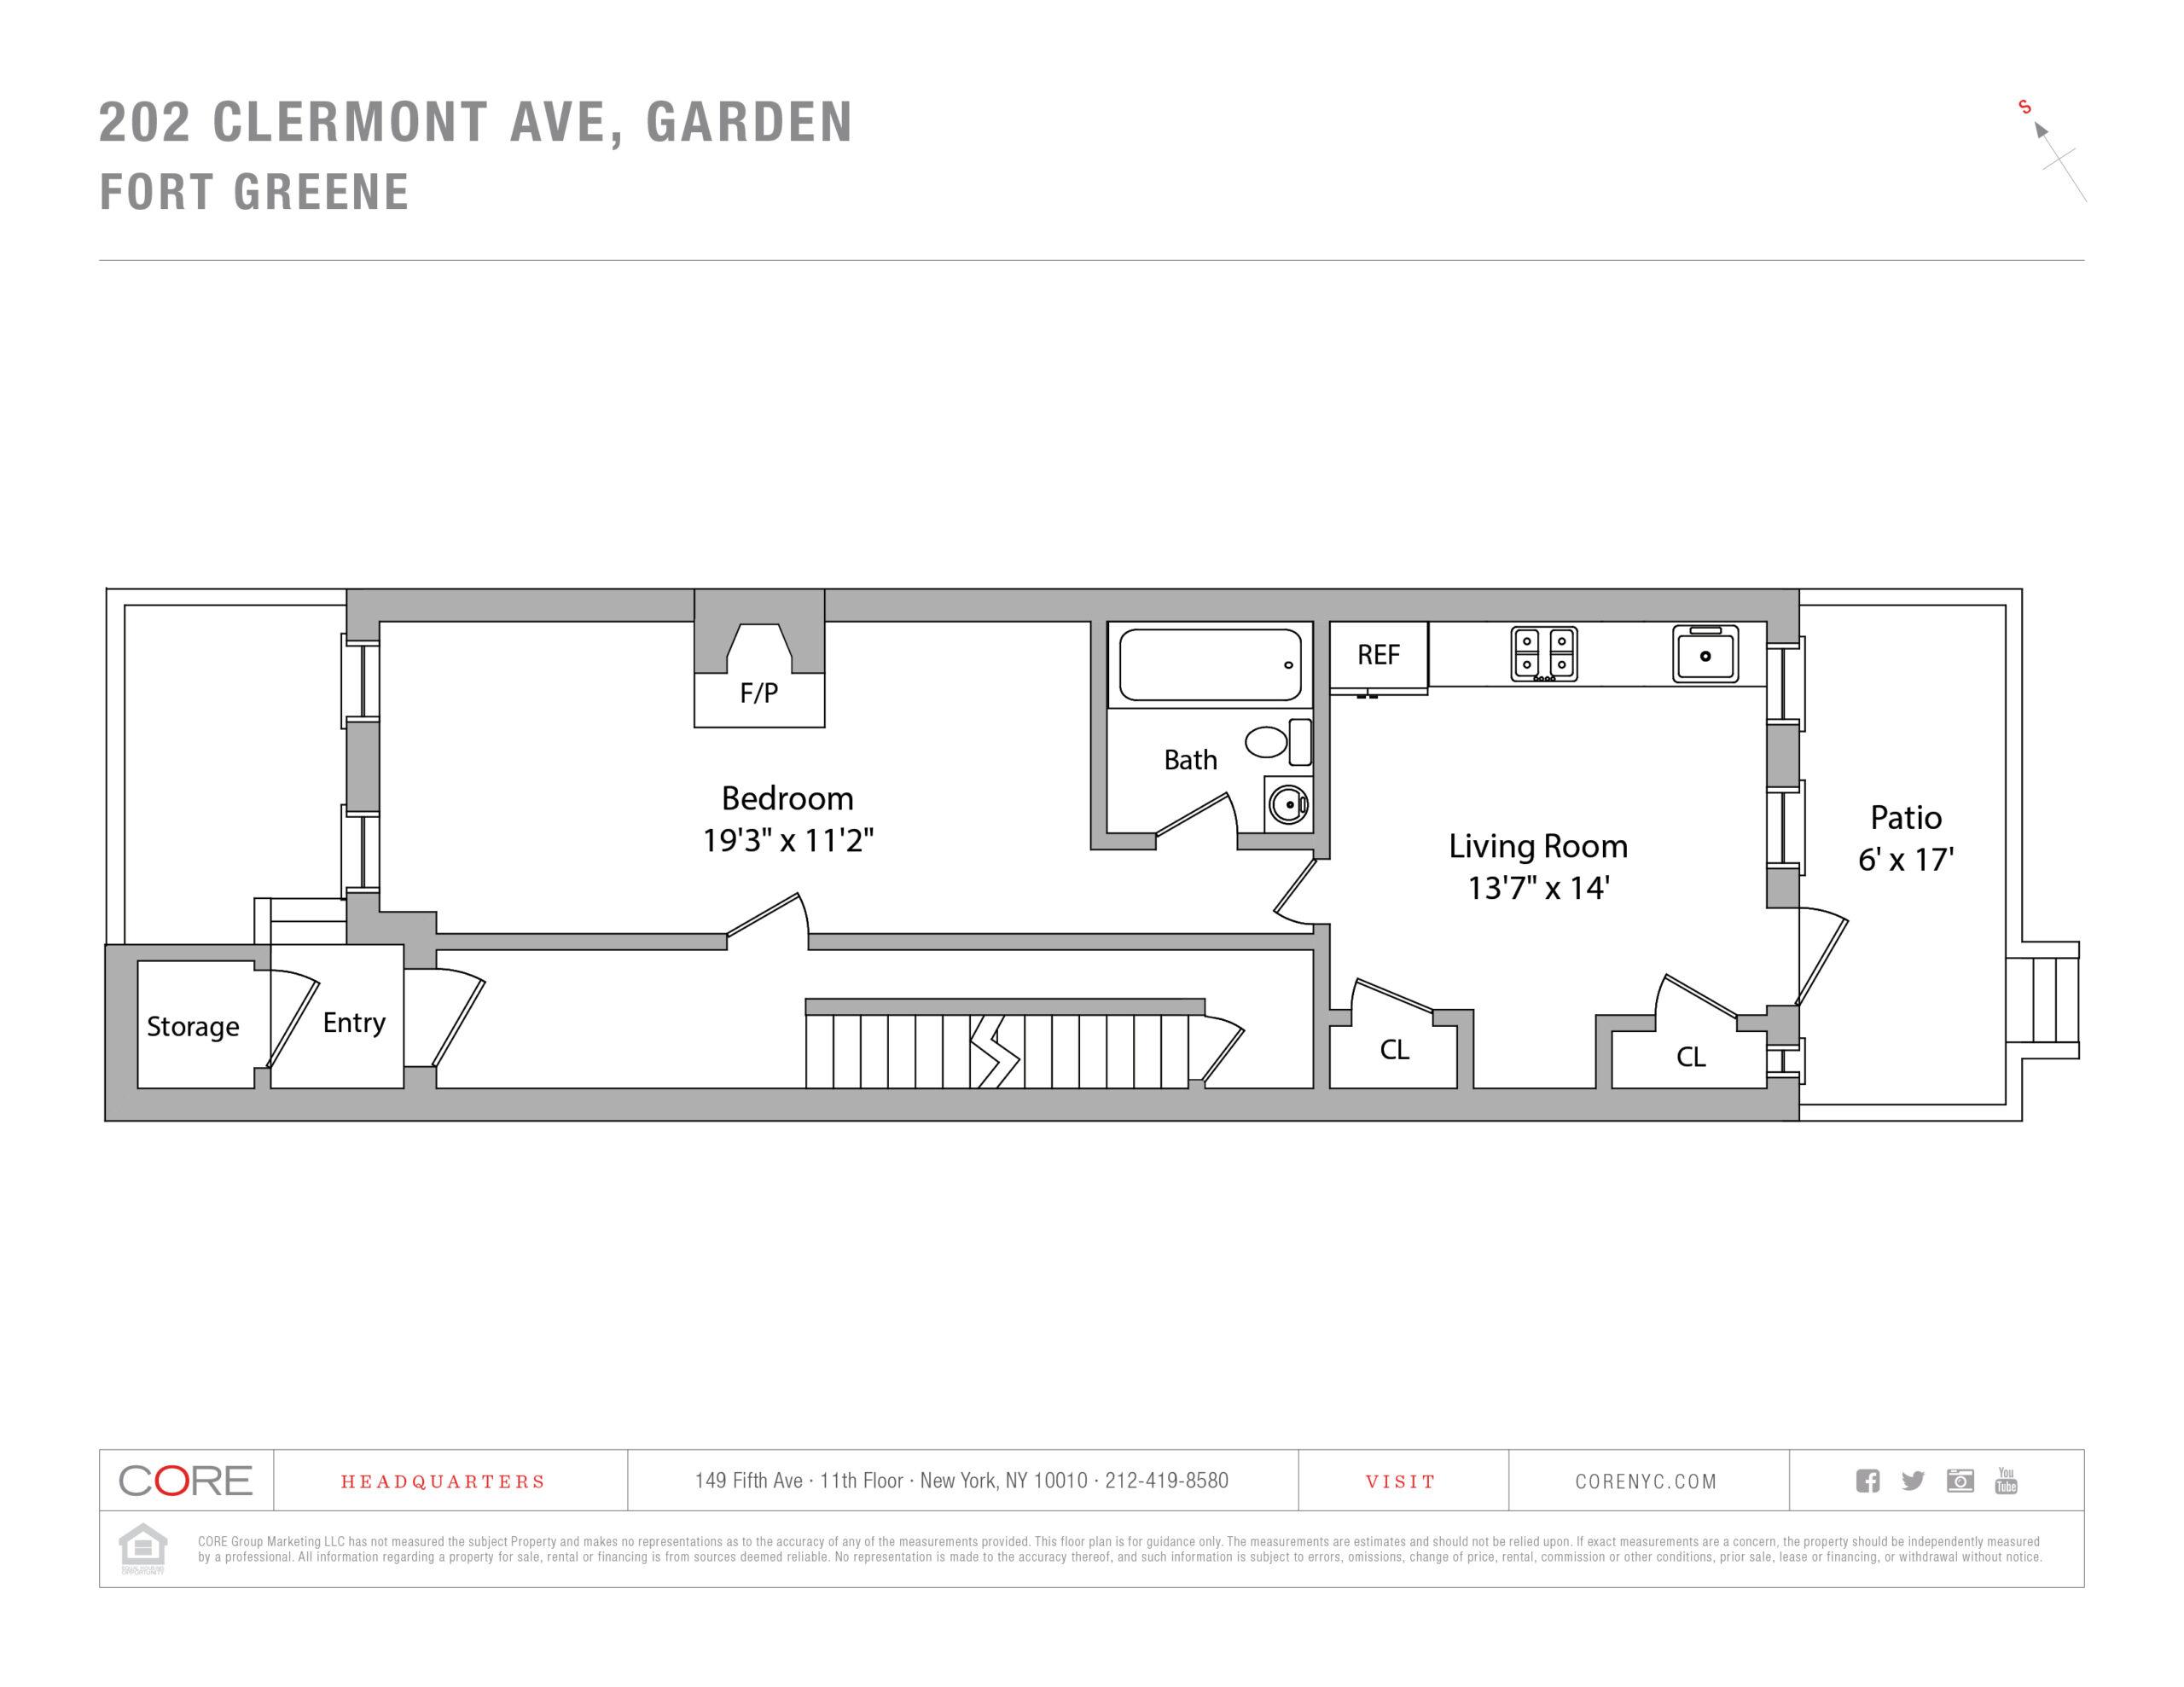 202 Clermont Ave. GARDEN, Brooklyn, NY 11205